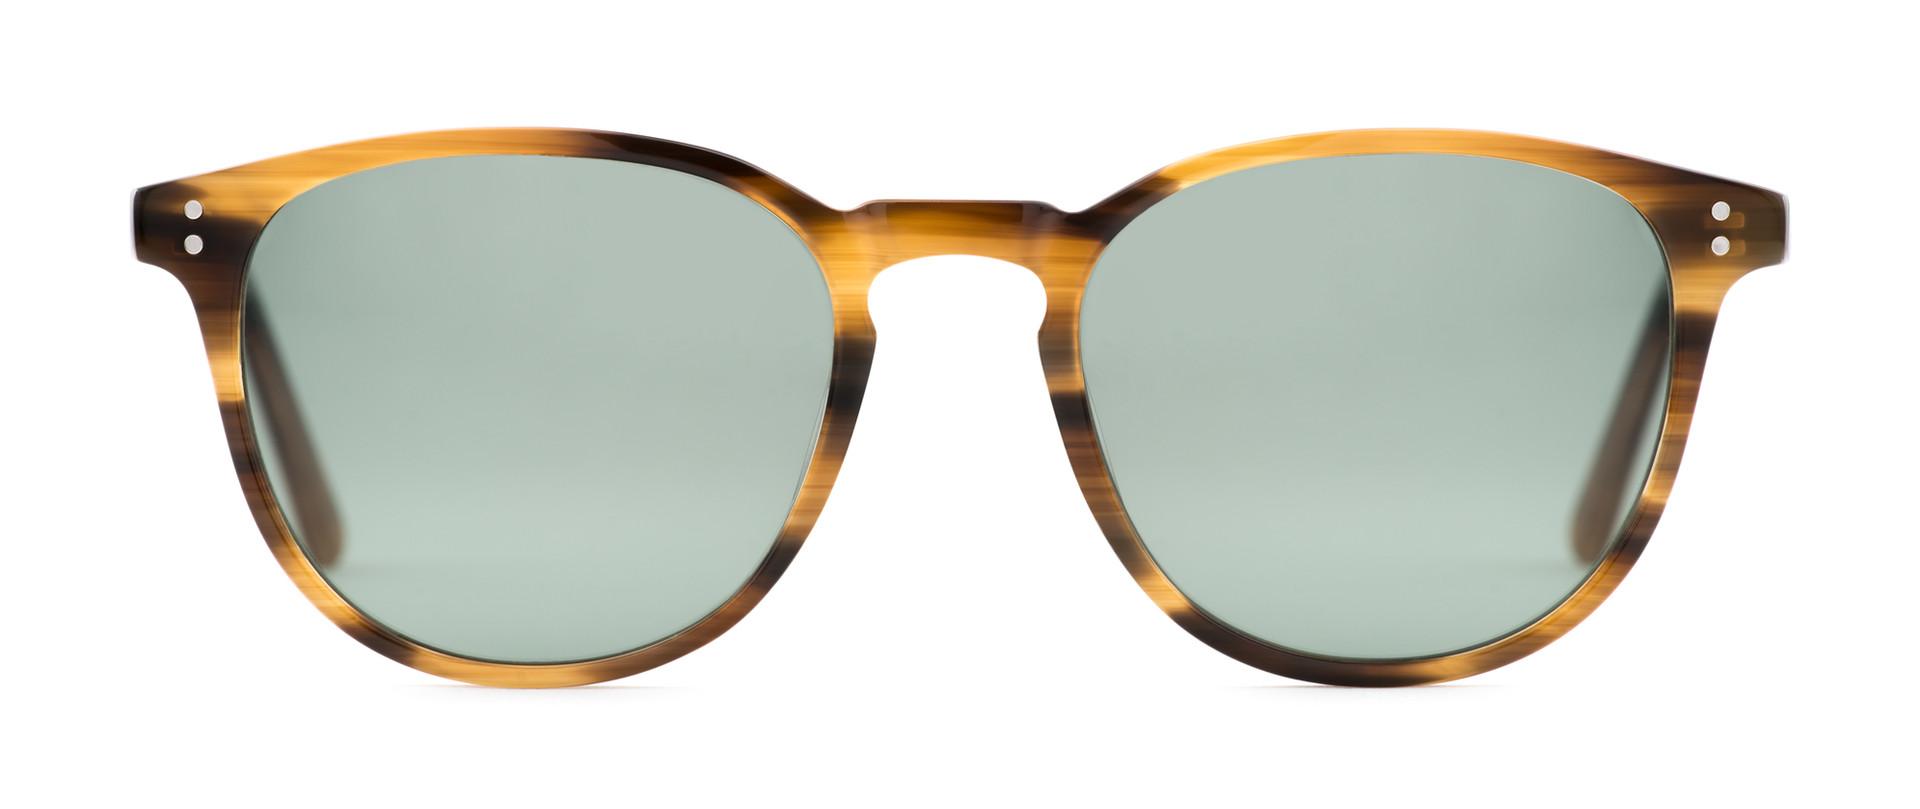 Pelton Jefferson Sunglasses